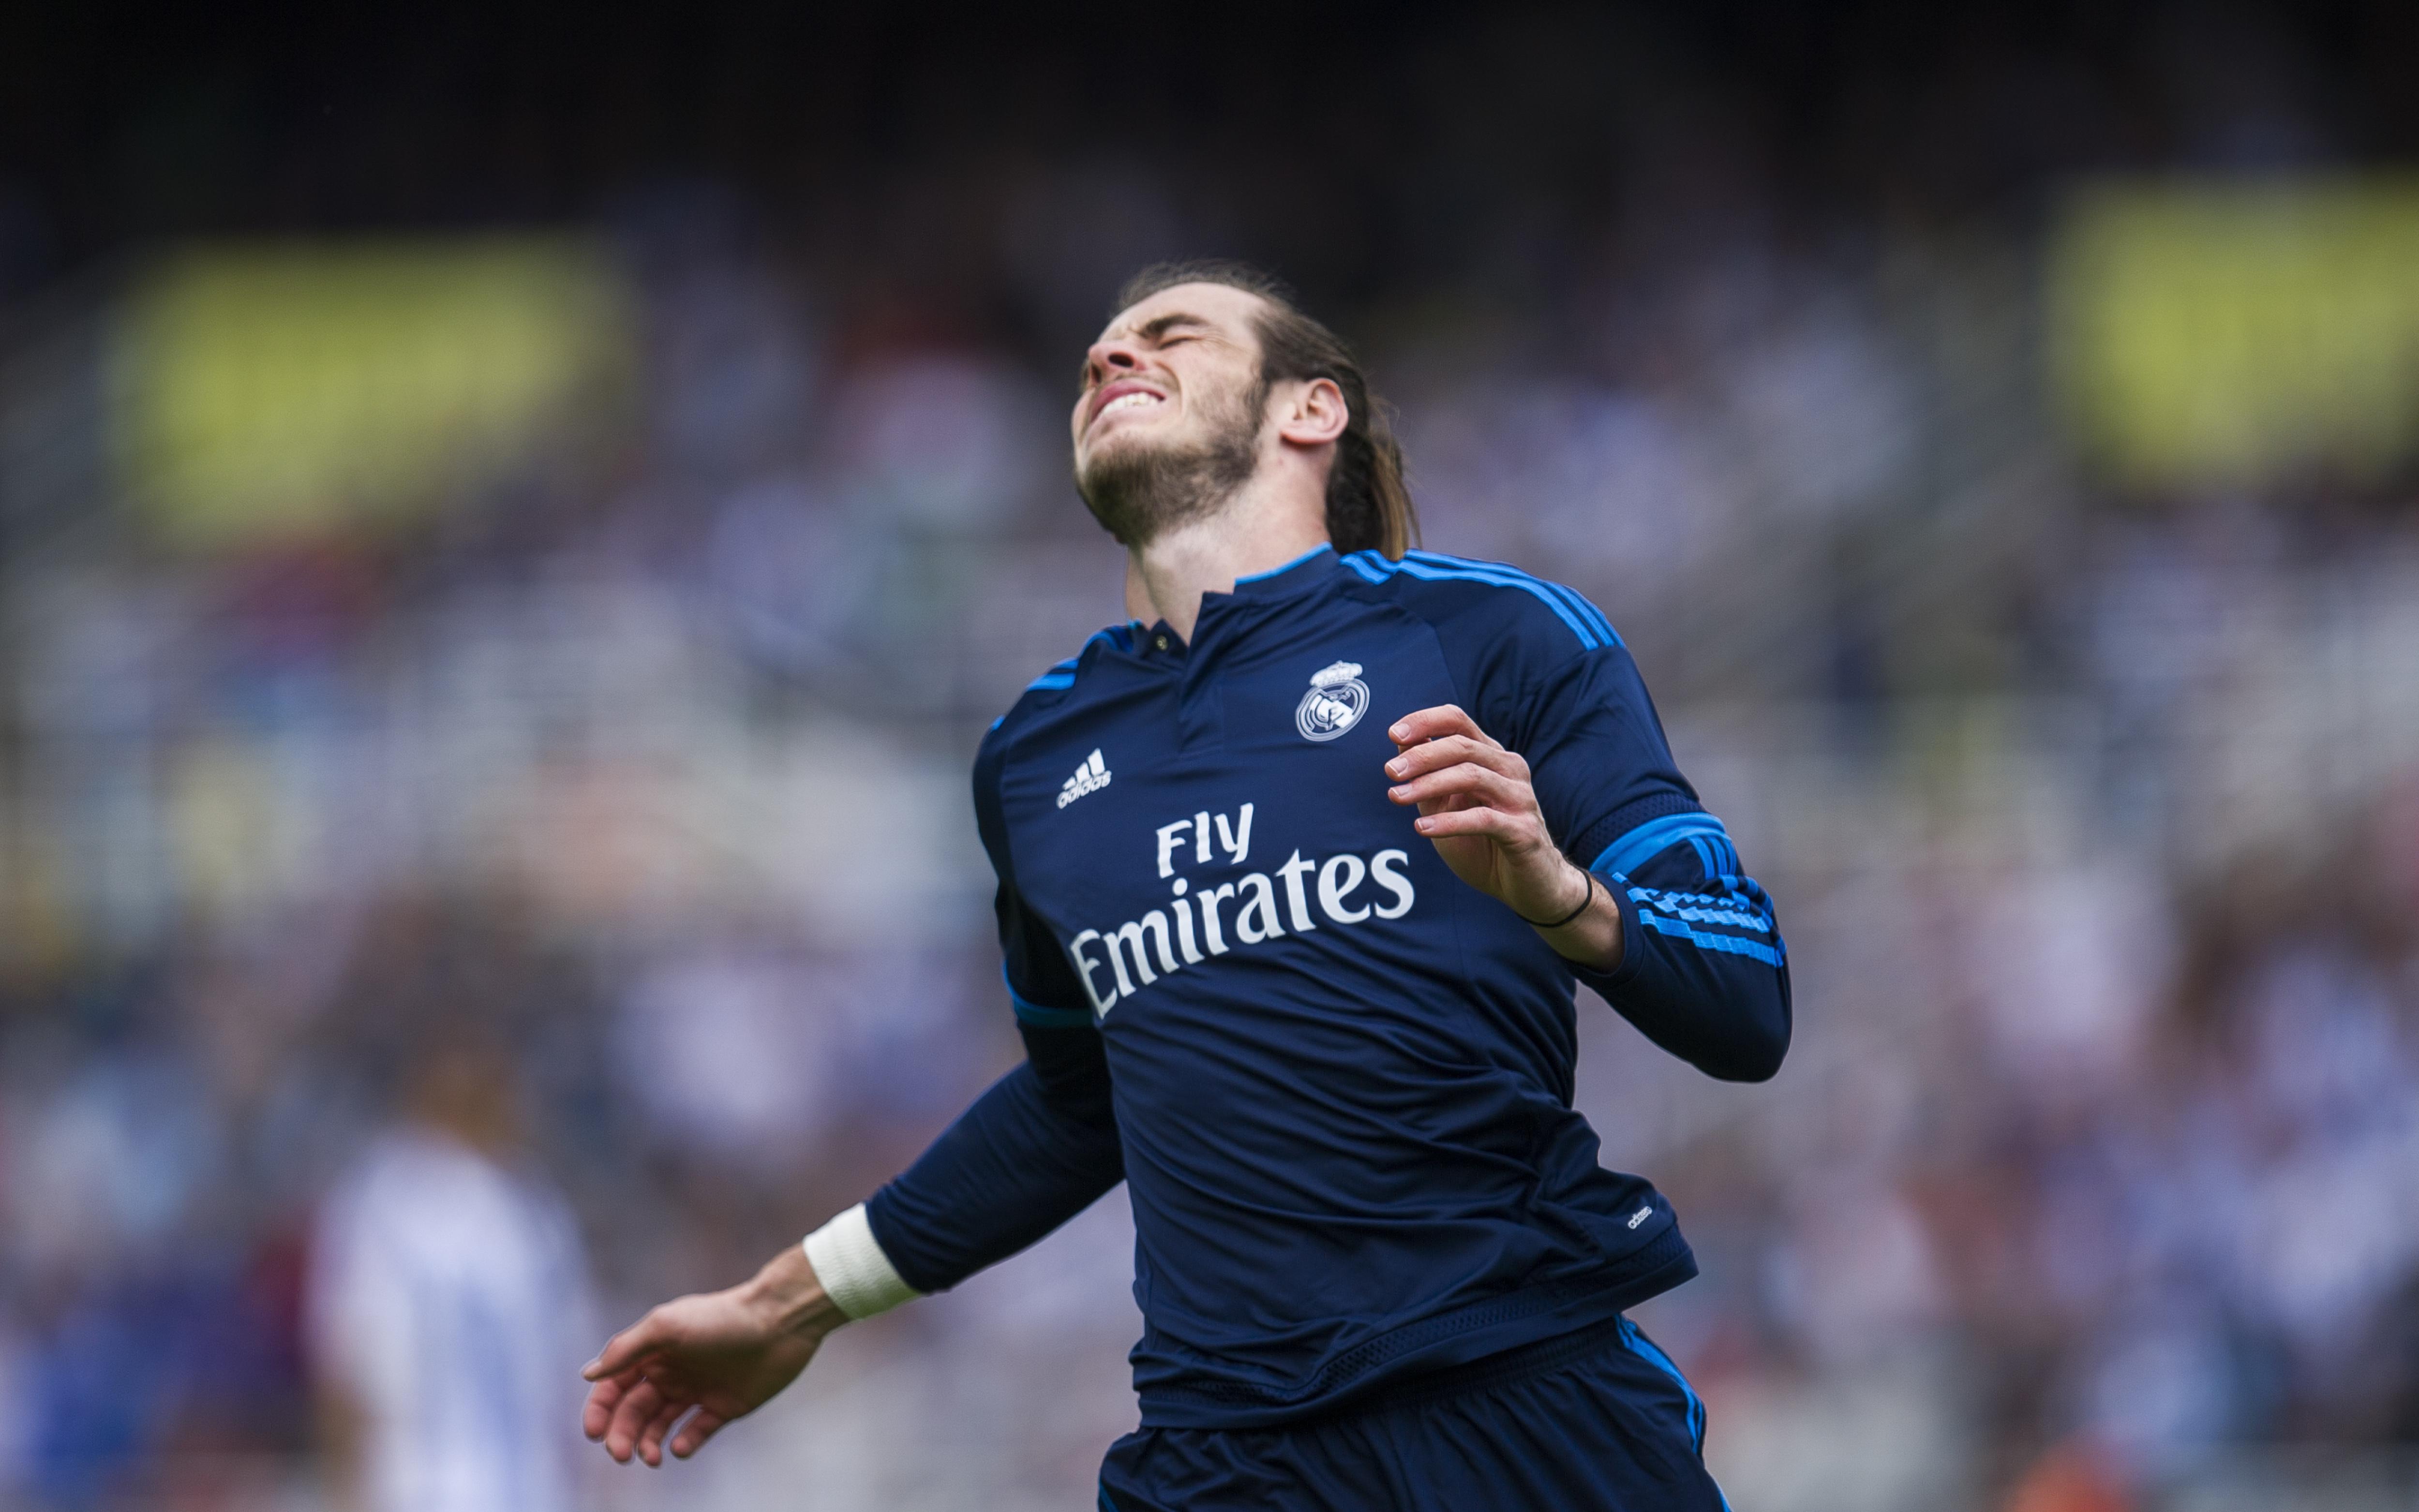 Реал Сосиедад - Реал Мадрид - 0:1